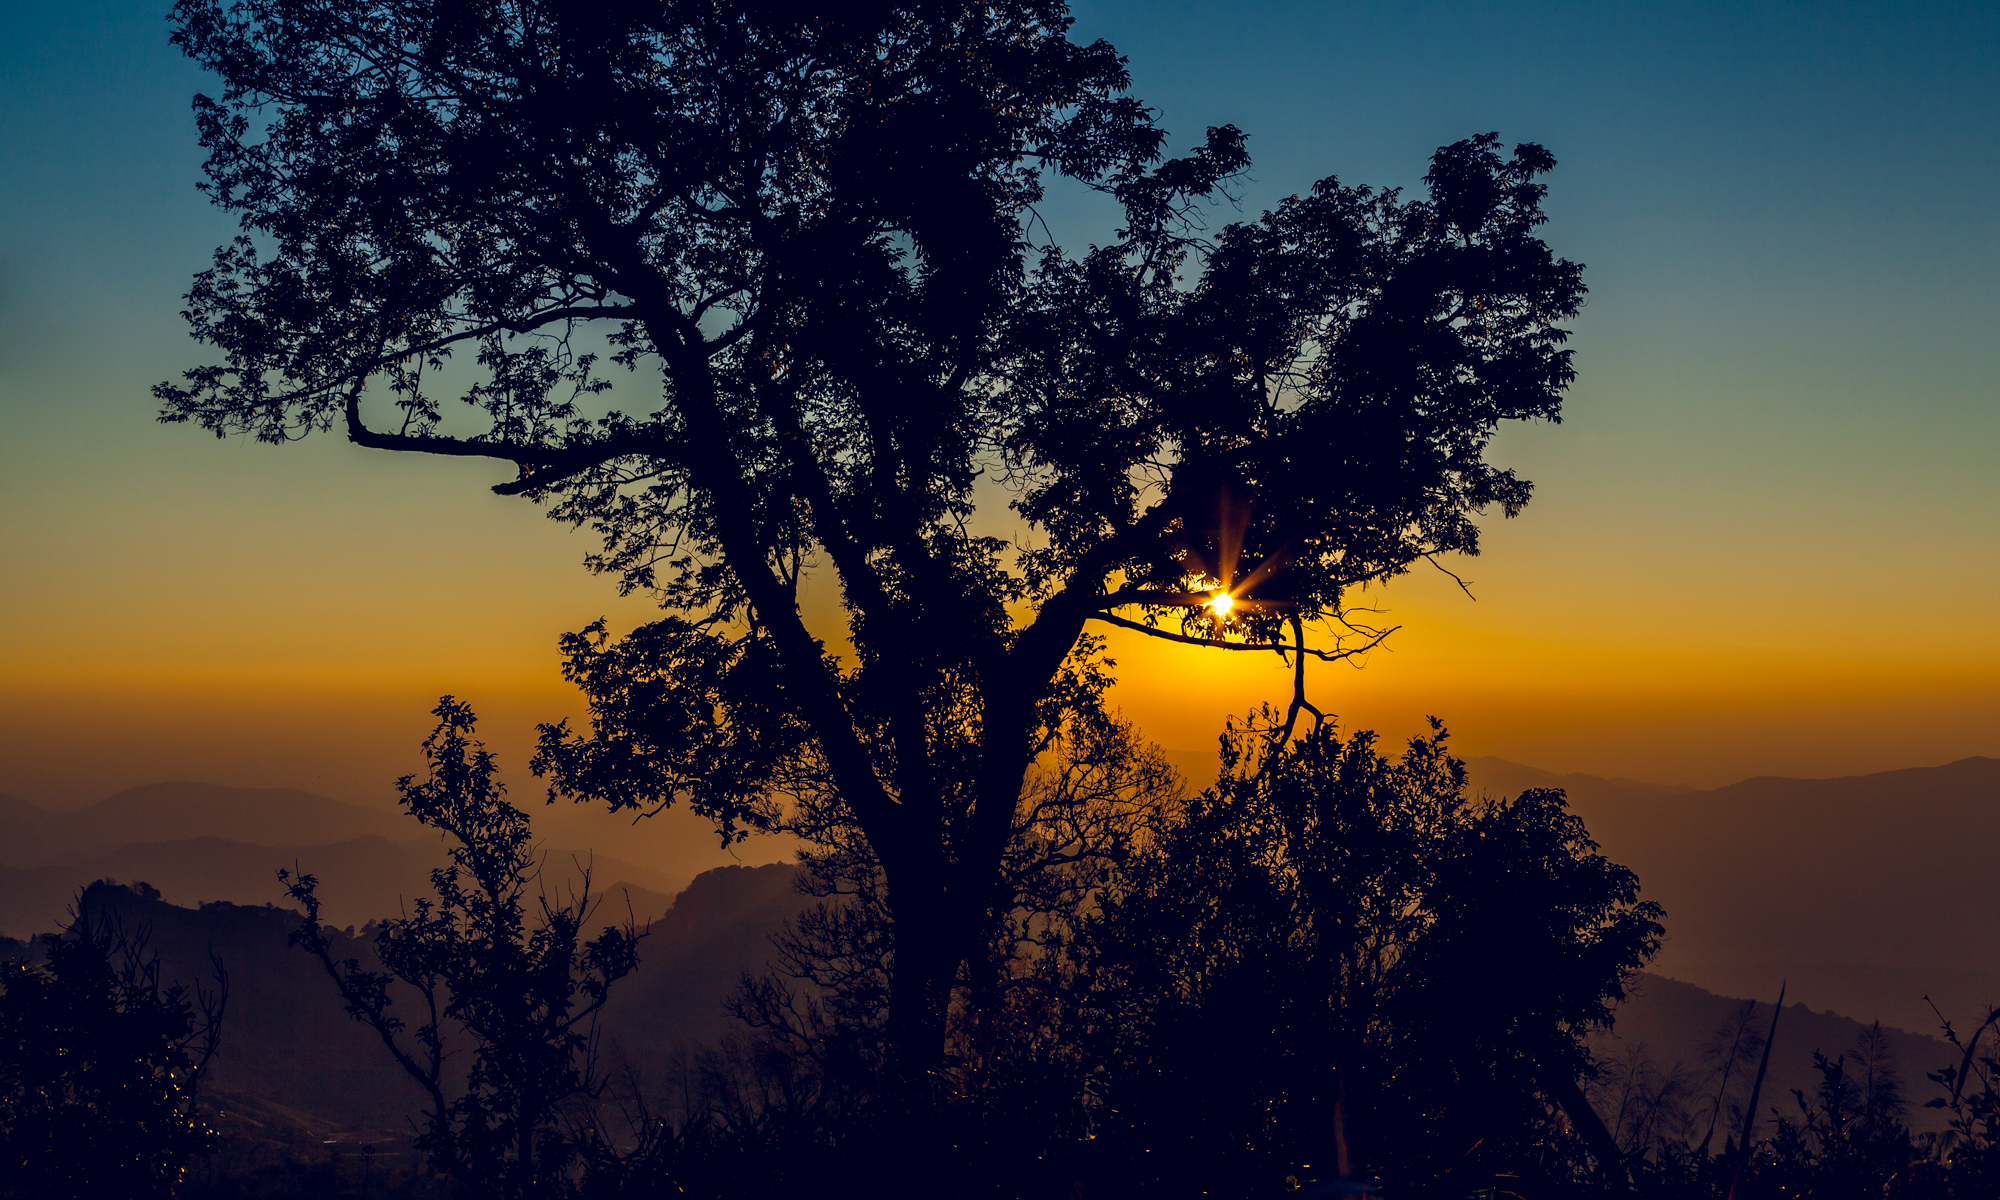 sunset-IMG_6342-2000.jpg